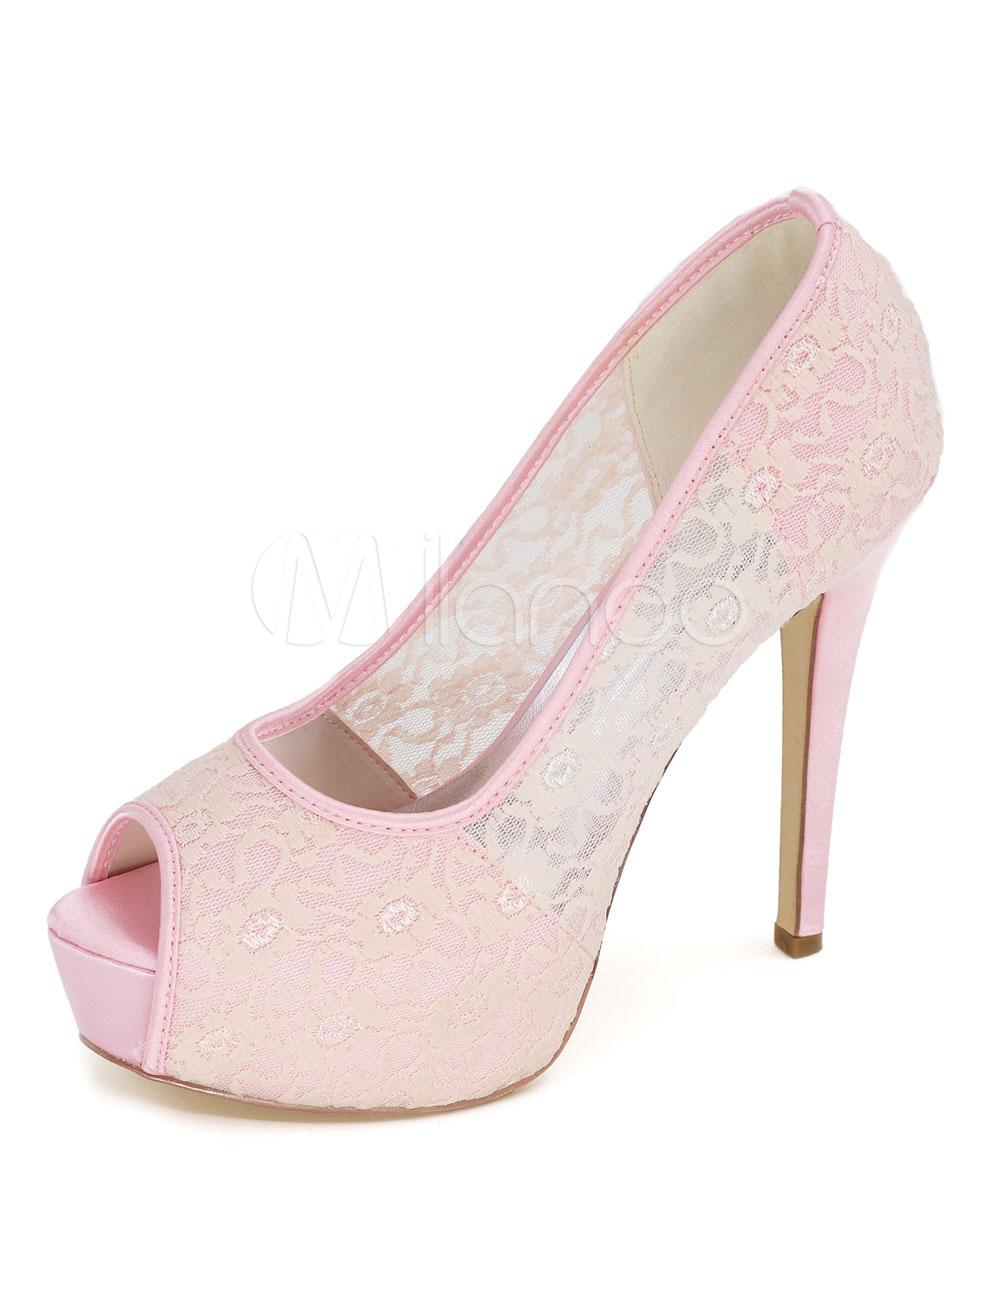 Platform Wedding Shoes Pink Lace Mesh Peep Toe Slip On High Heel Bridal Shoes